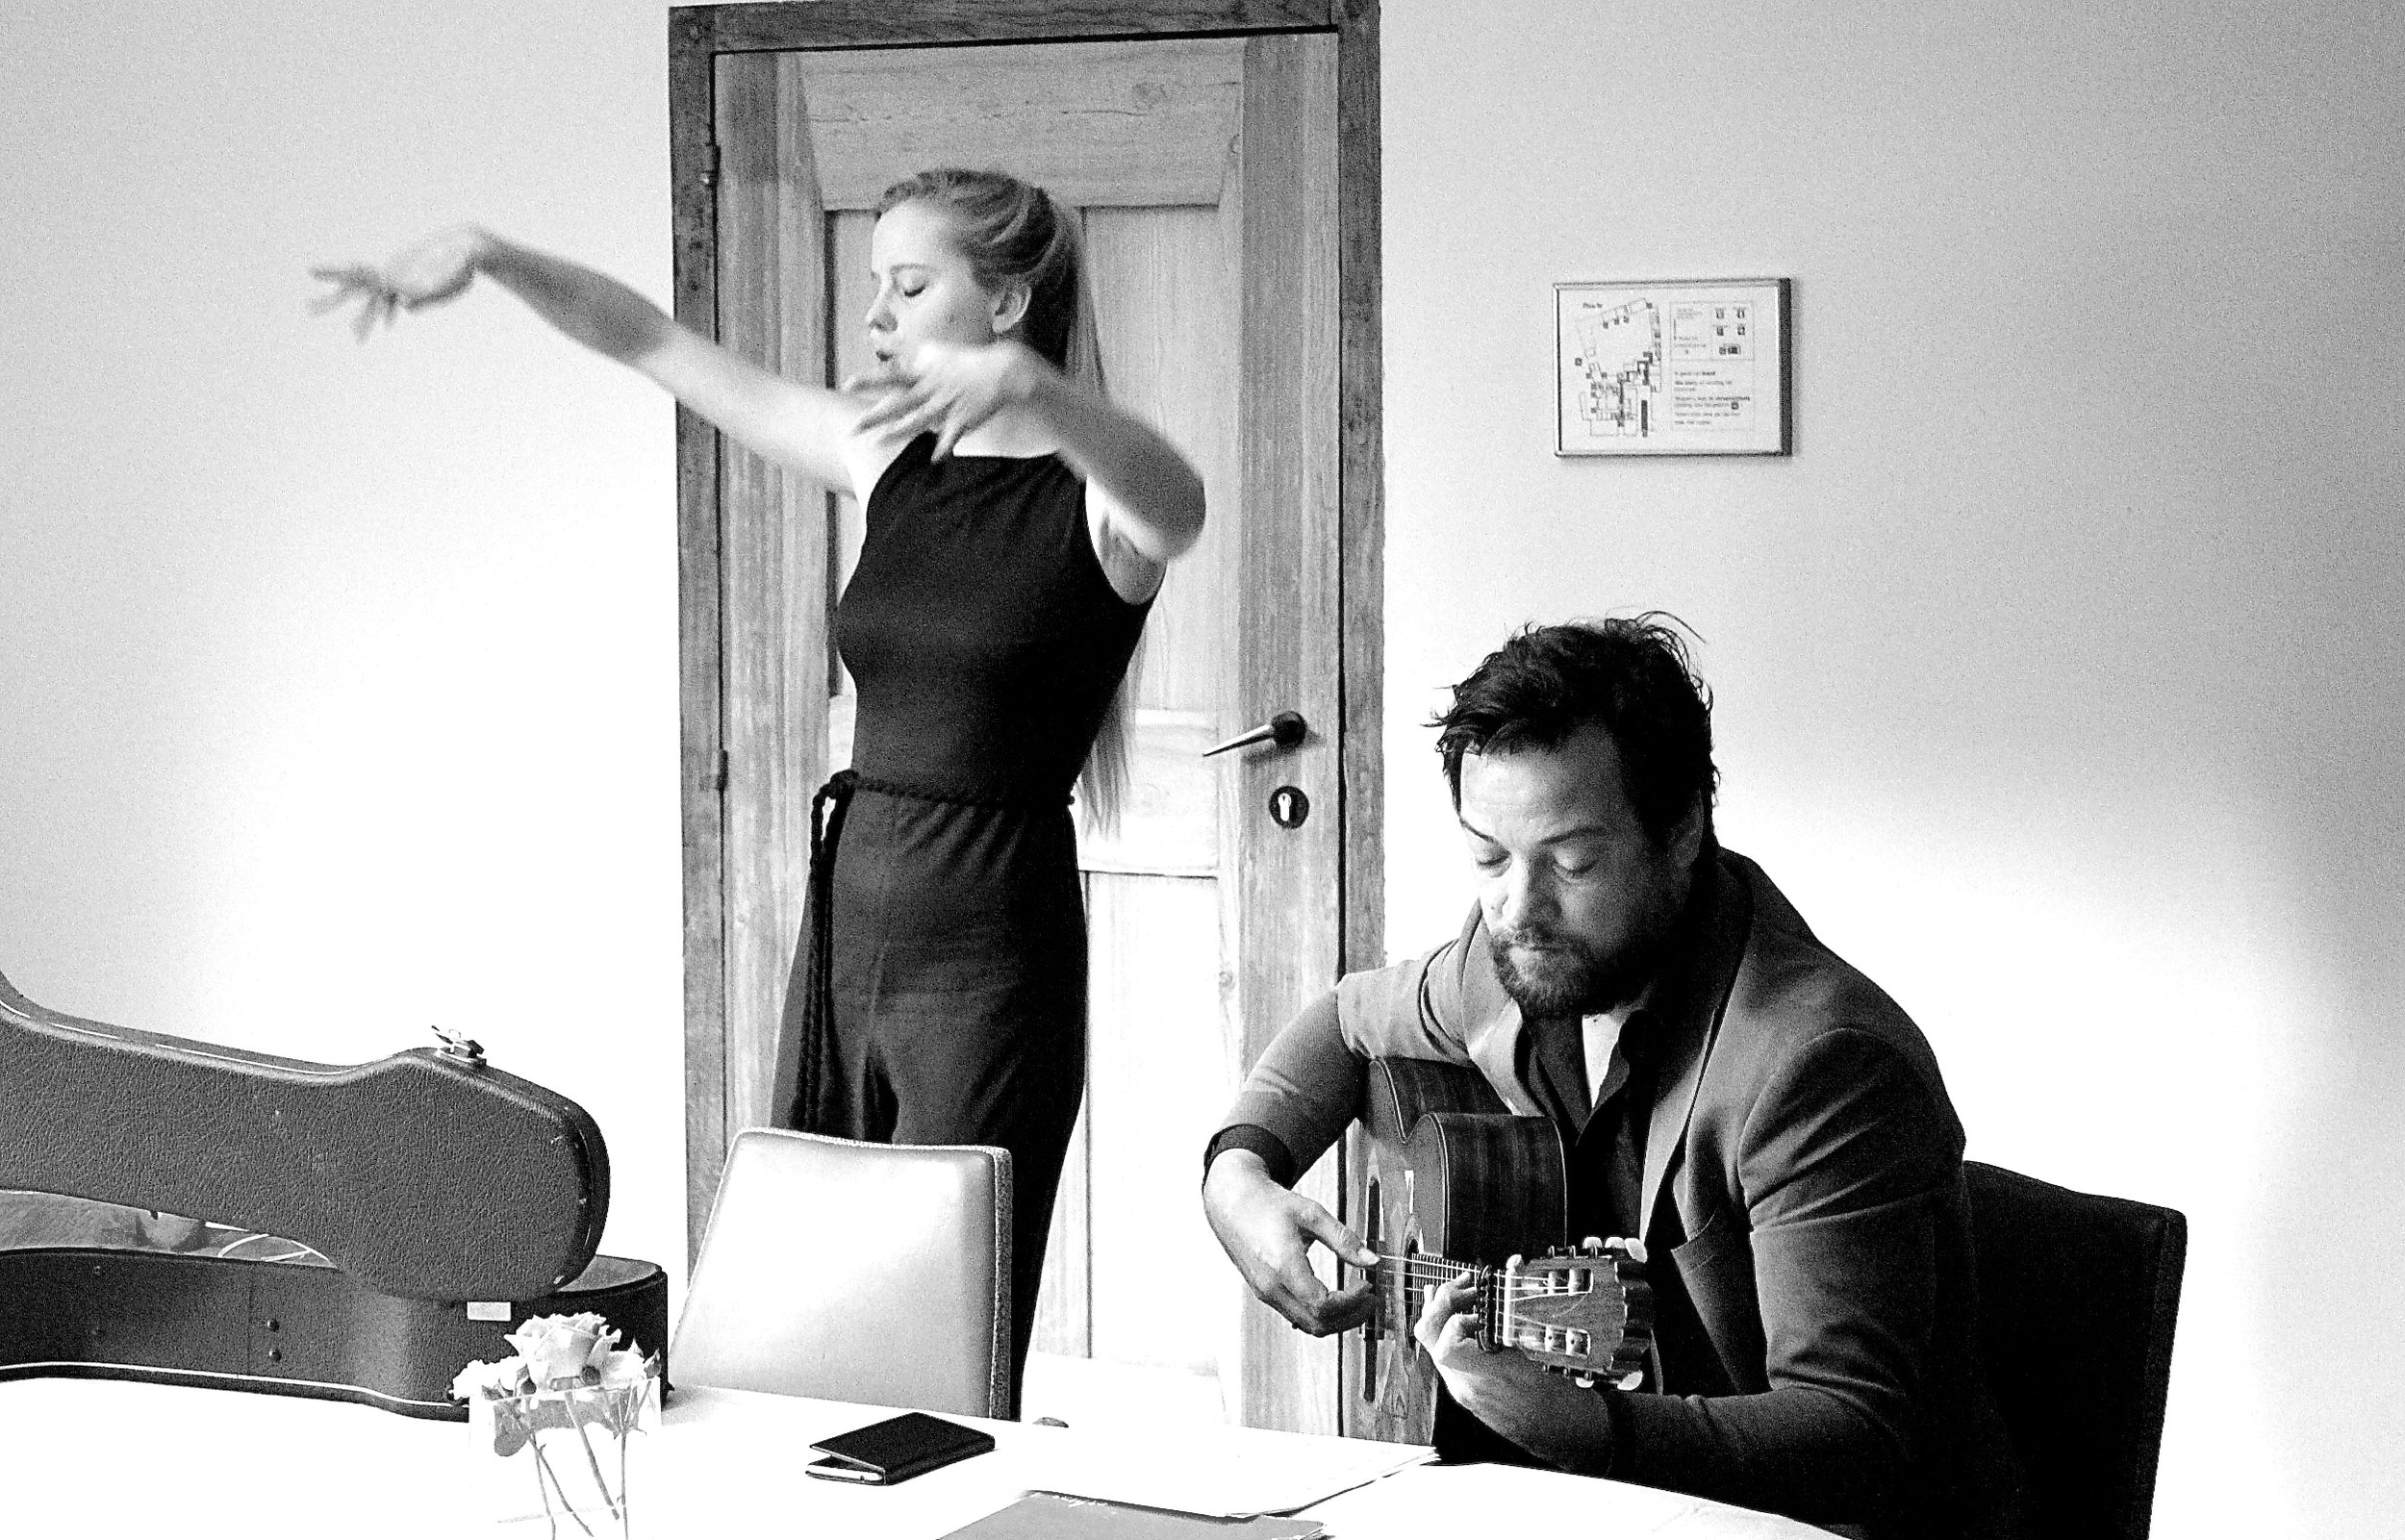 Lieselot De Wilde and Peter Verhelst by Laura D'Halleweyn